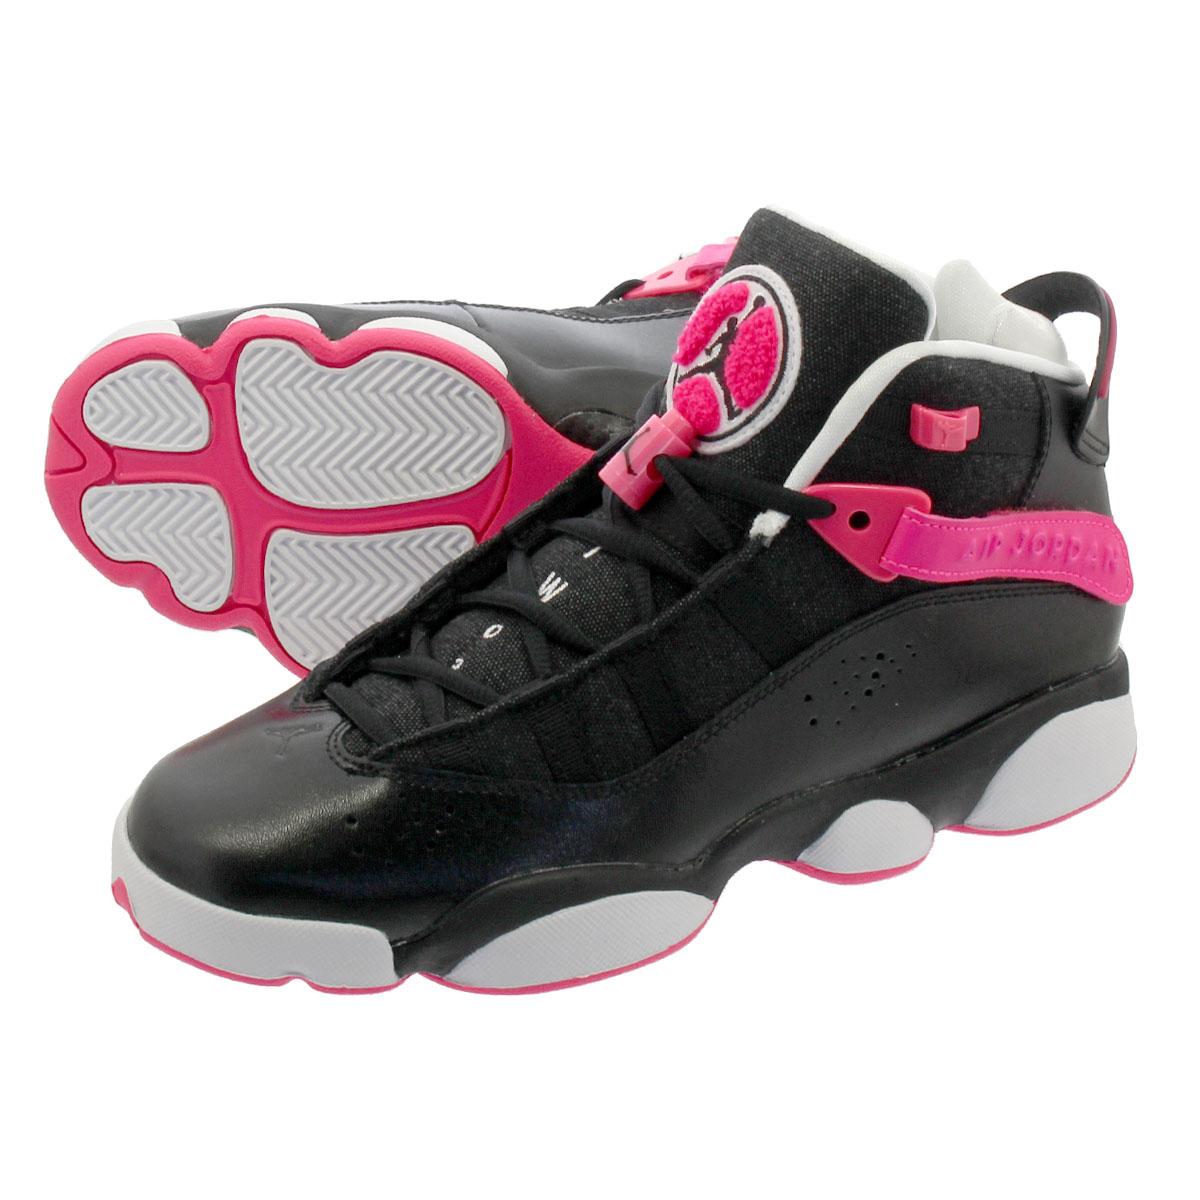 4012357495d LOWTEX PLUS: NIKE AIR JORDAN 6 RINGS GS Nike Jordan 6 RINGS Co.,Ltd. GS  BLACK/HYPER PINK/WHITE 323,399-061 | Rakuten Global Market